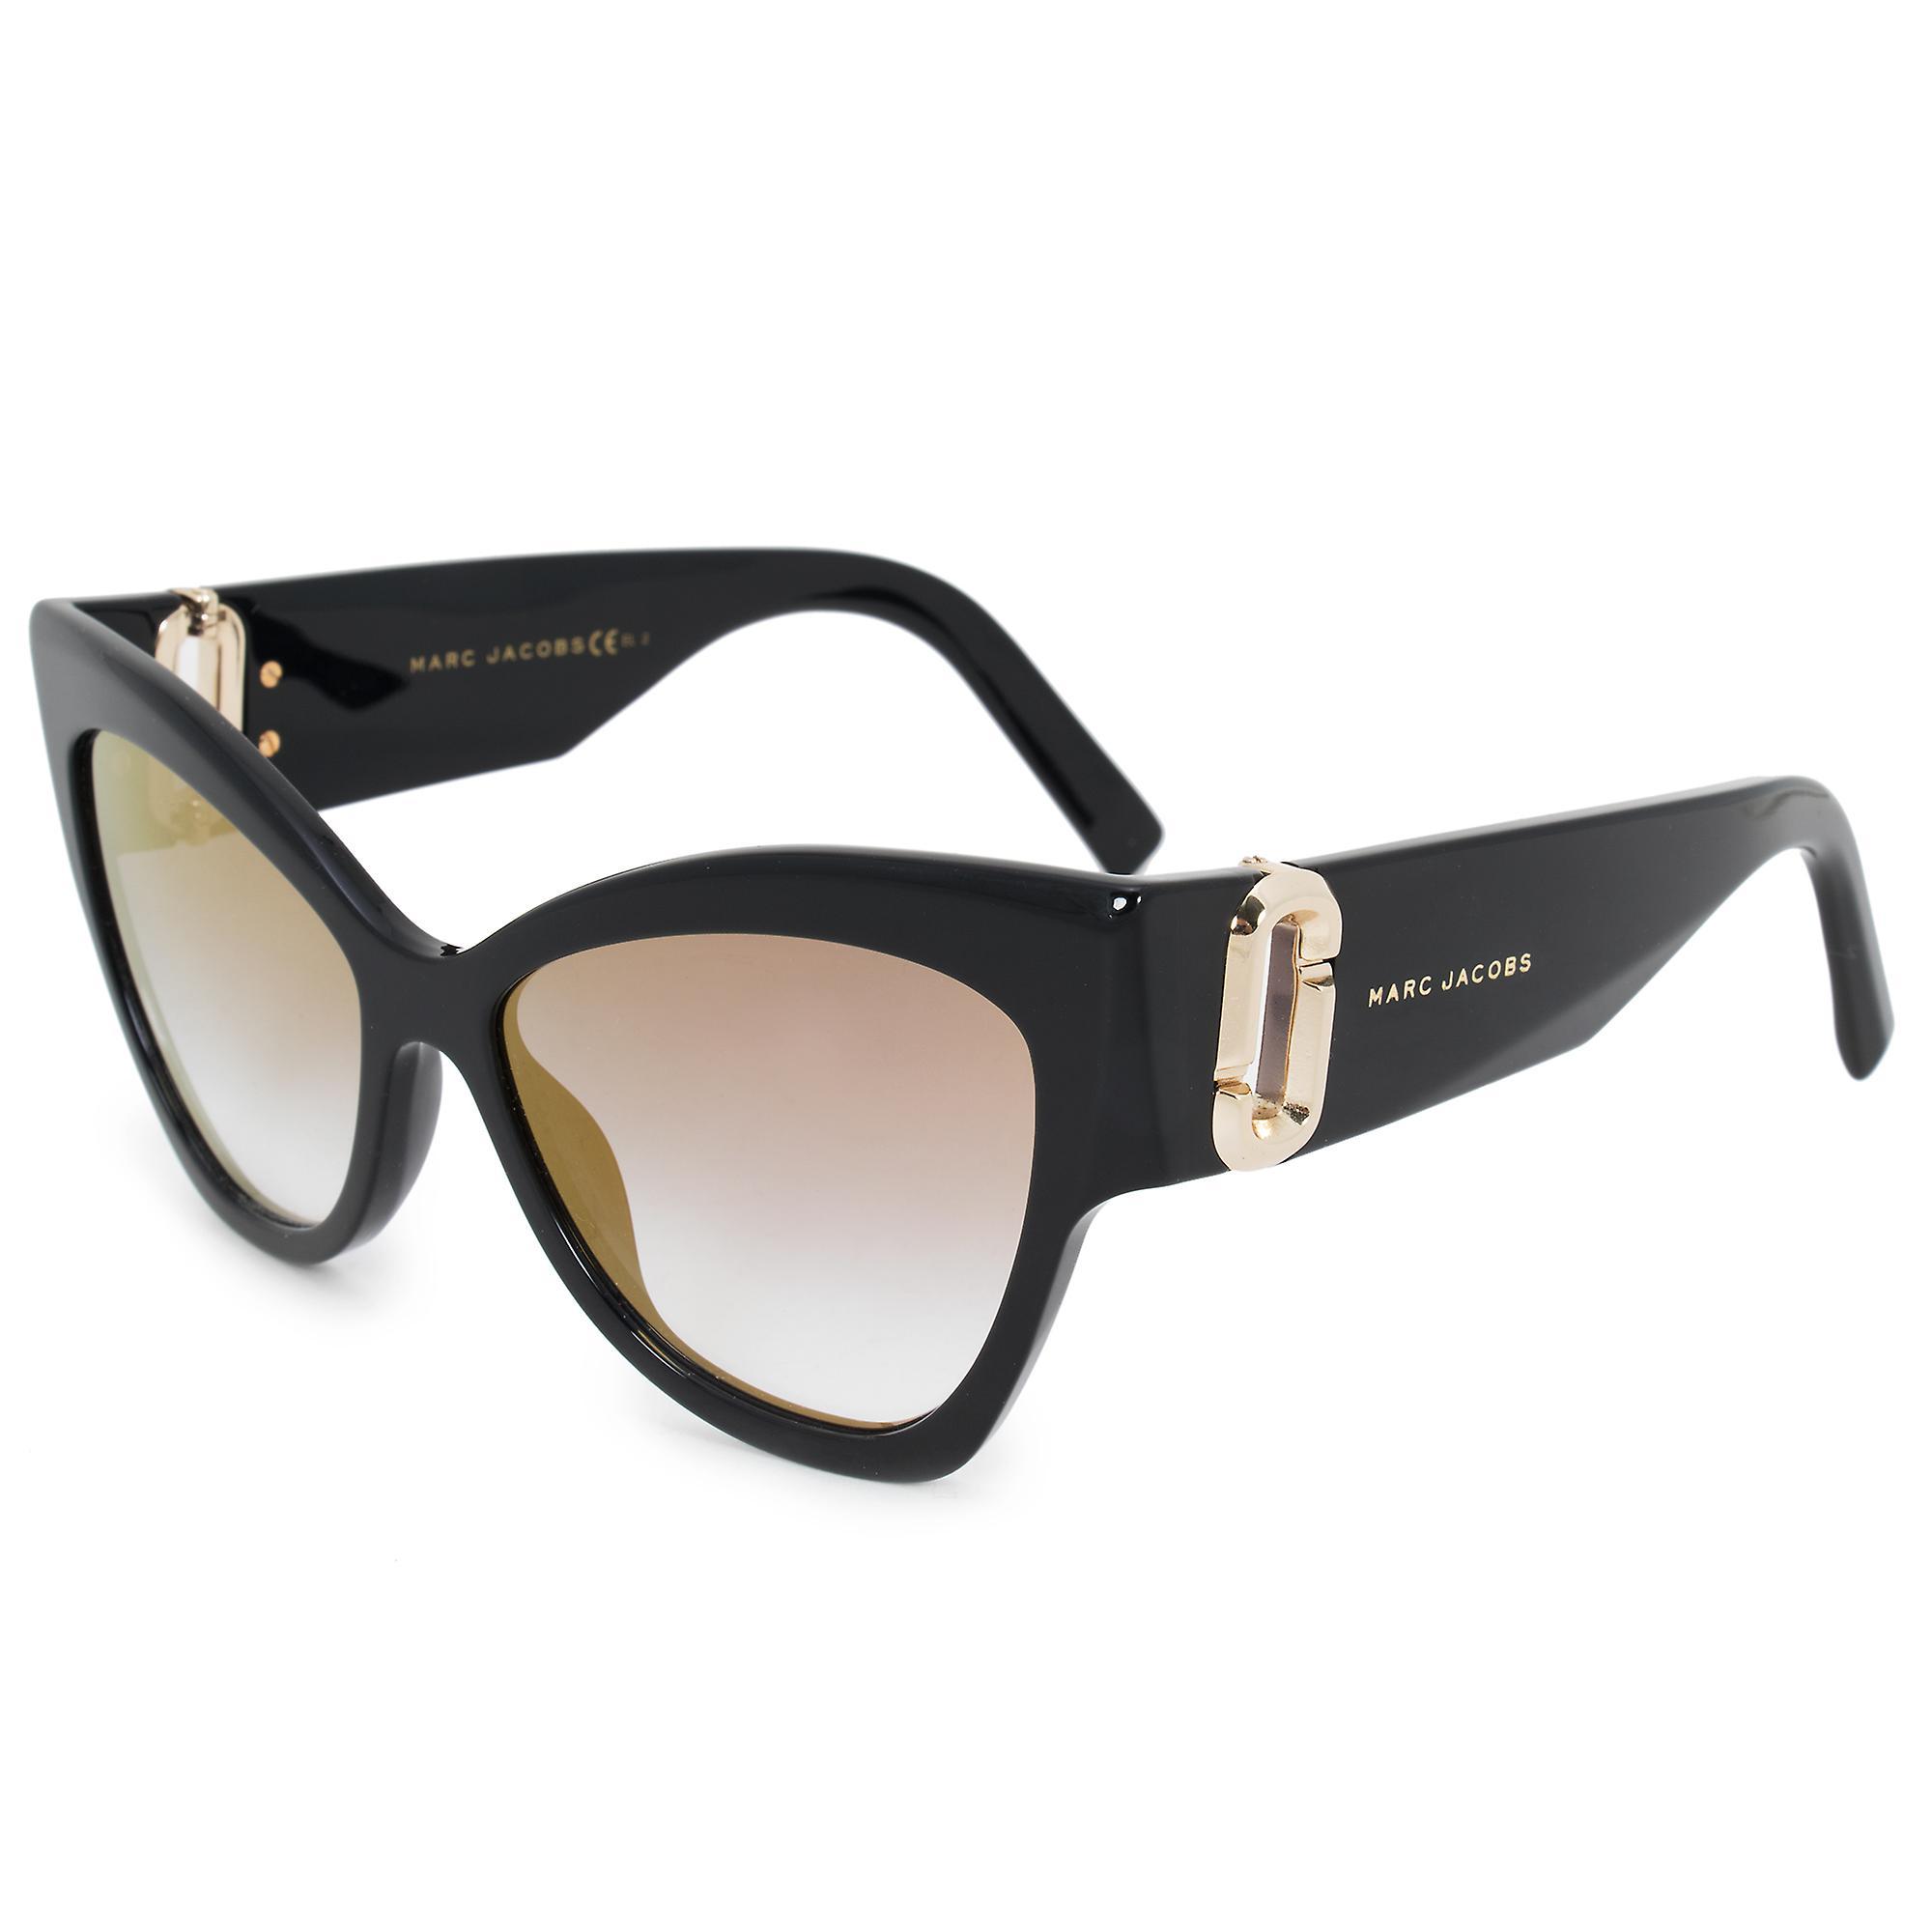 Marc Jacobs Cateye Sunglasses MJ109S 807 FQ 54